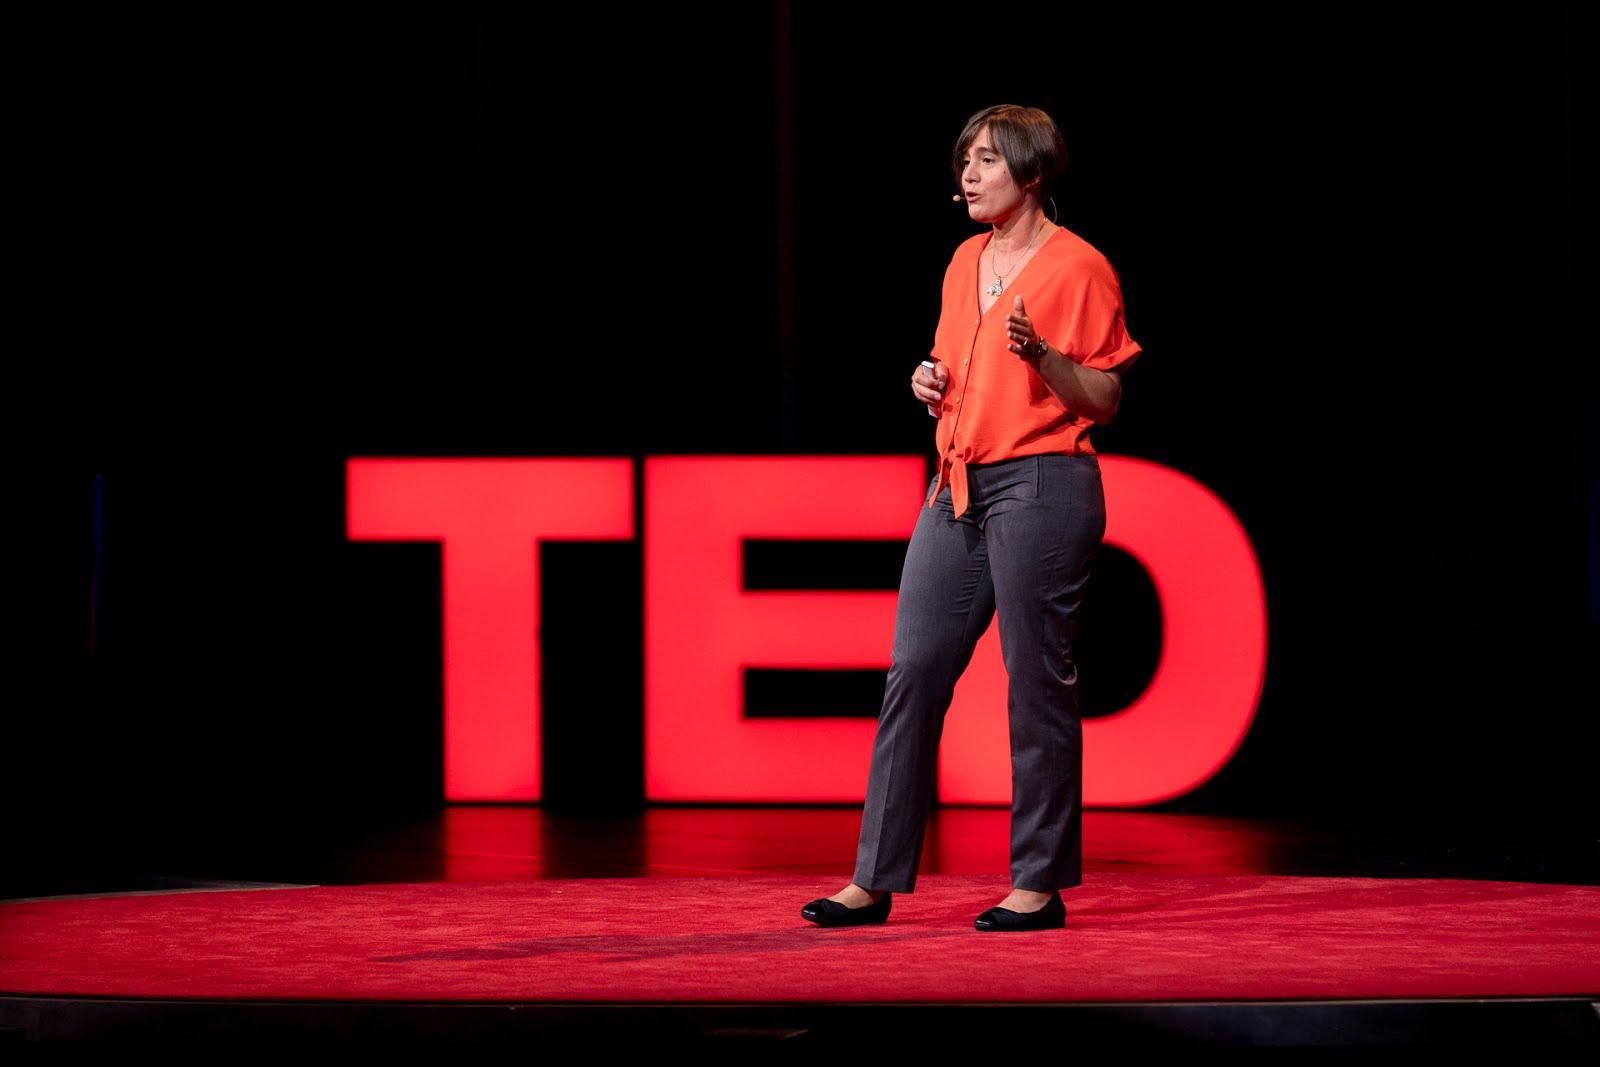 TED talk, 2019